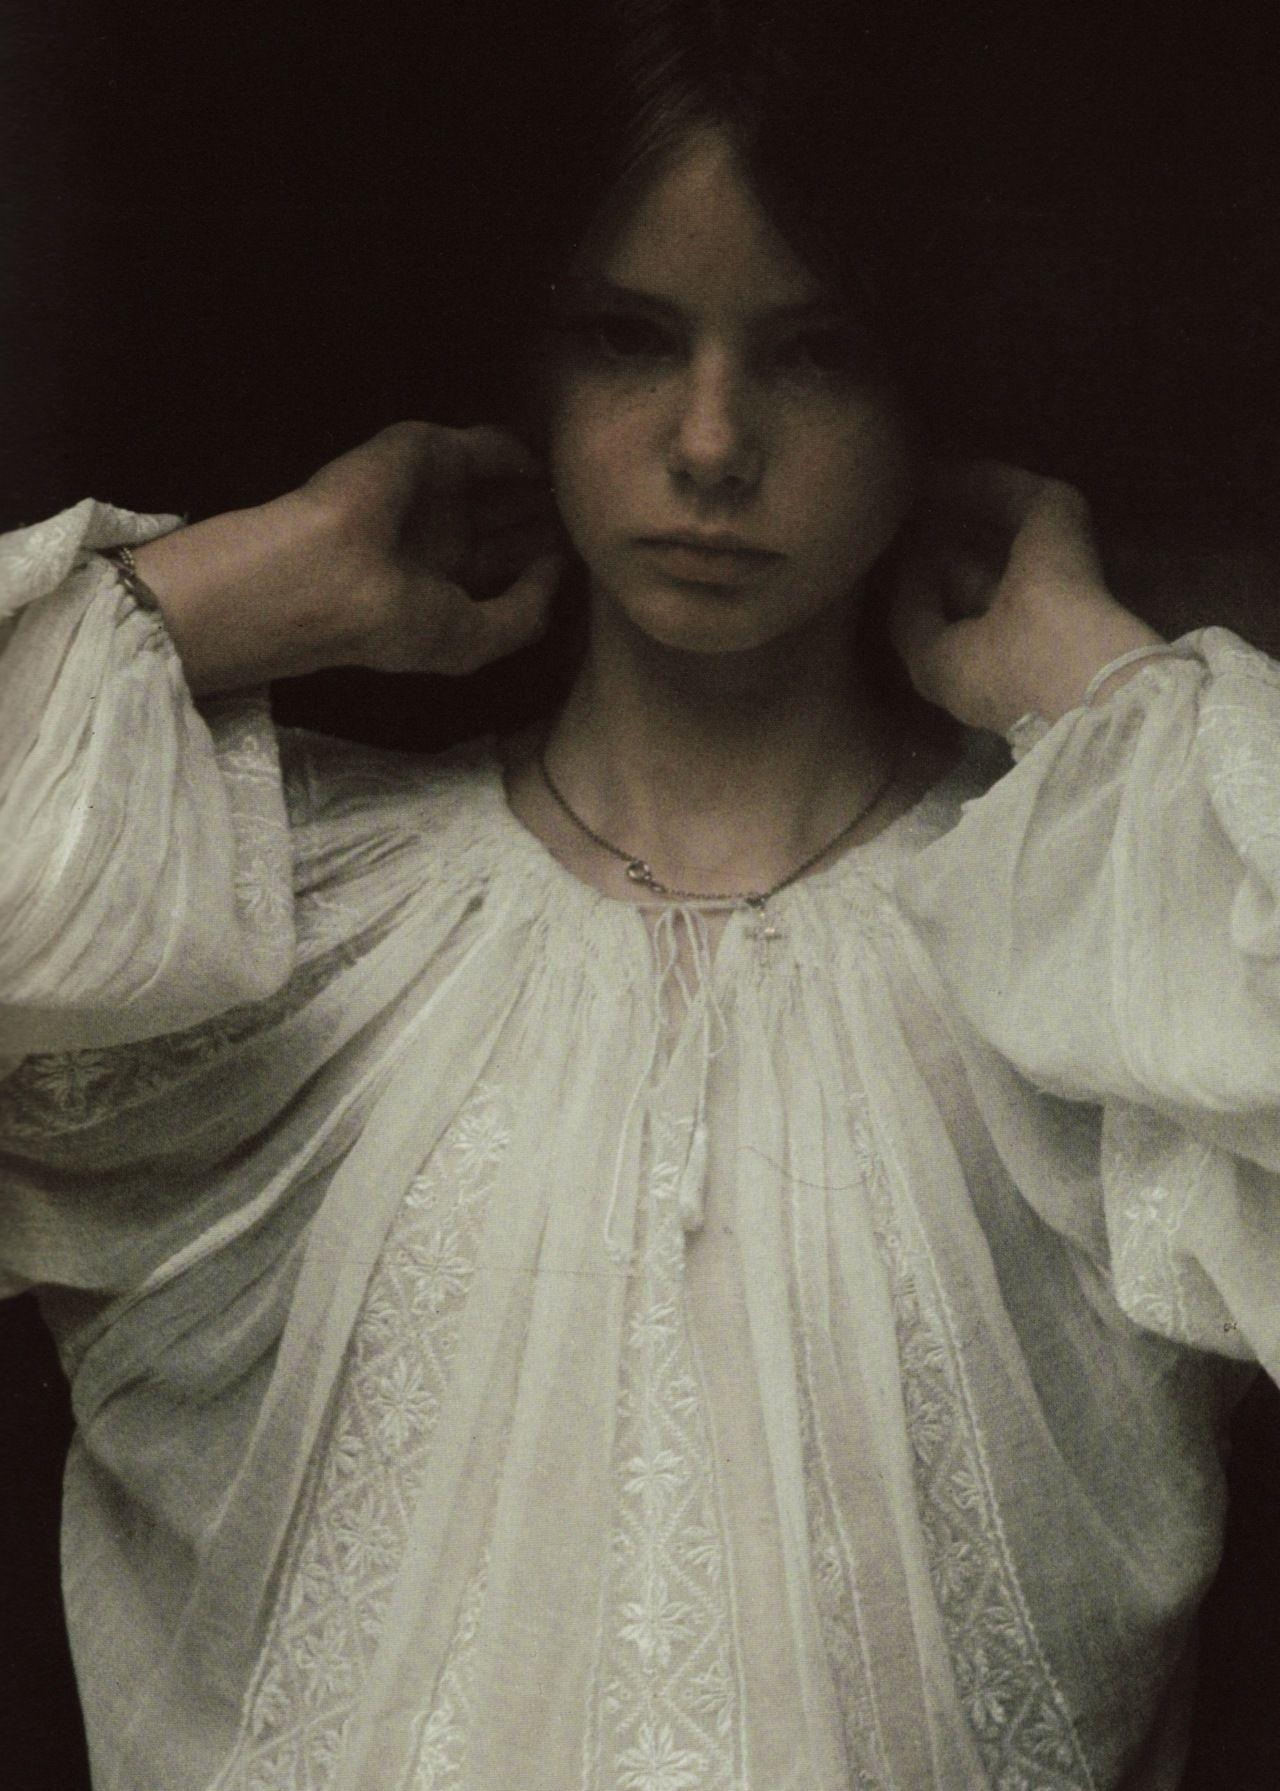 david hamilton la jeune fille / david hamilton / 1978